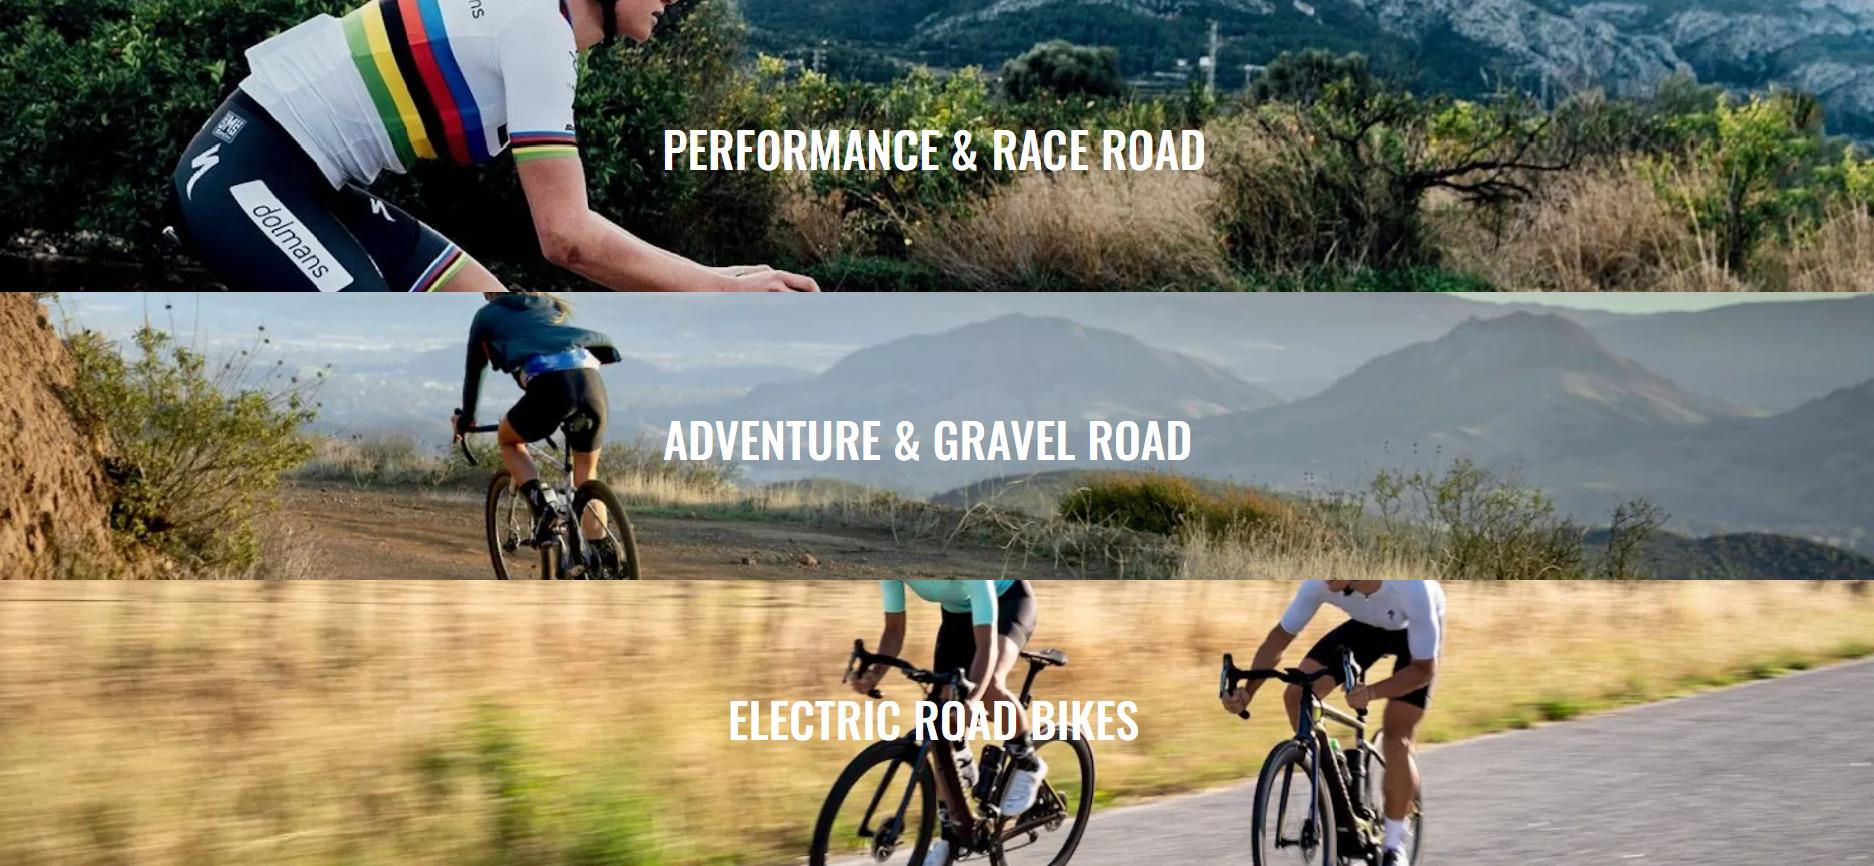 Mike's road bike categories